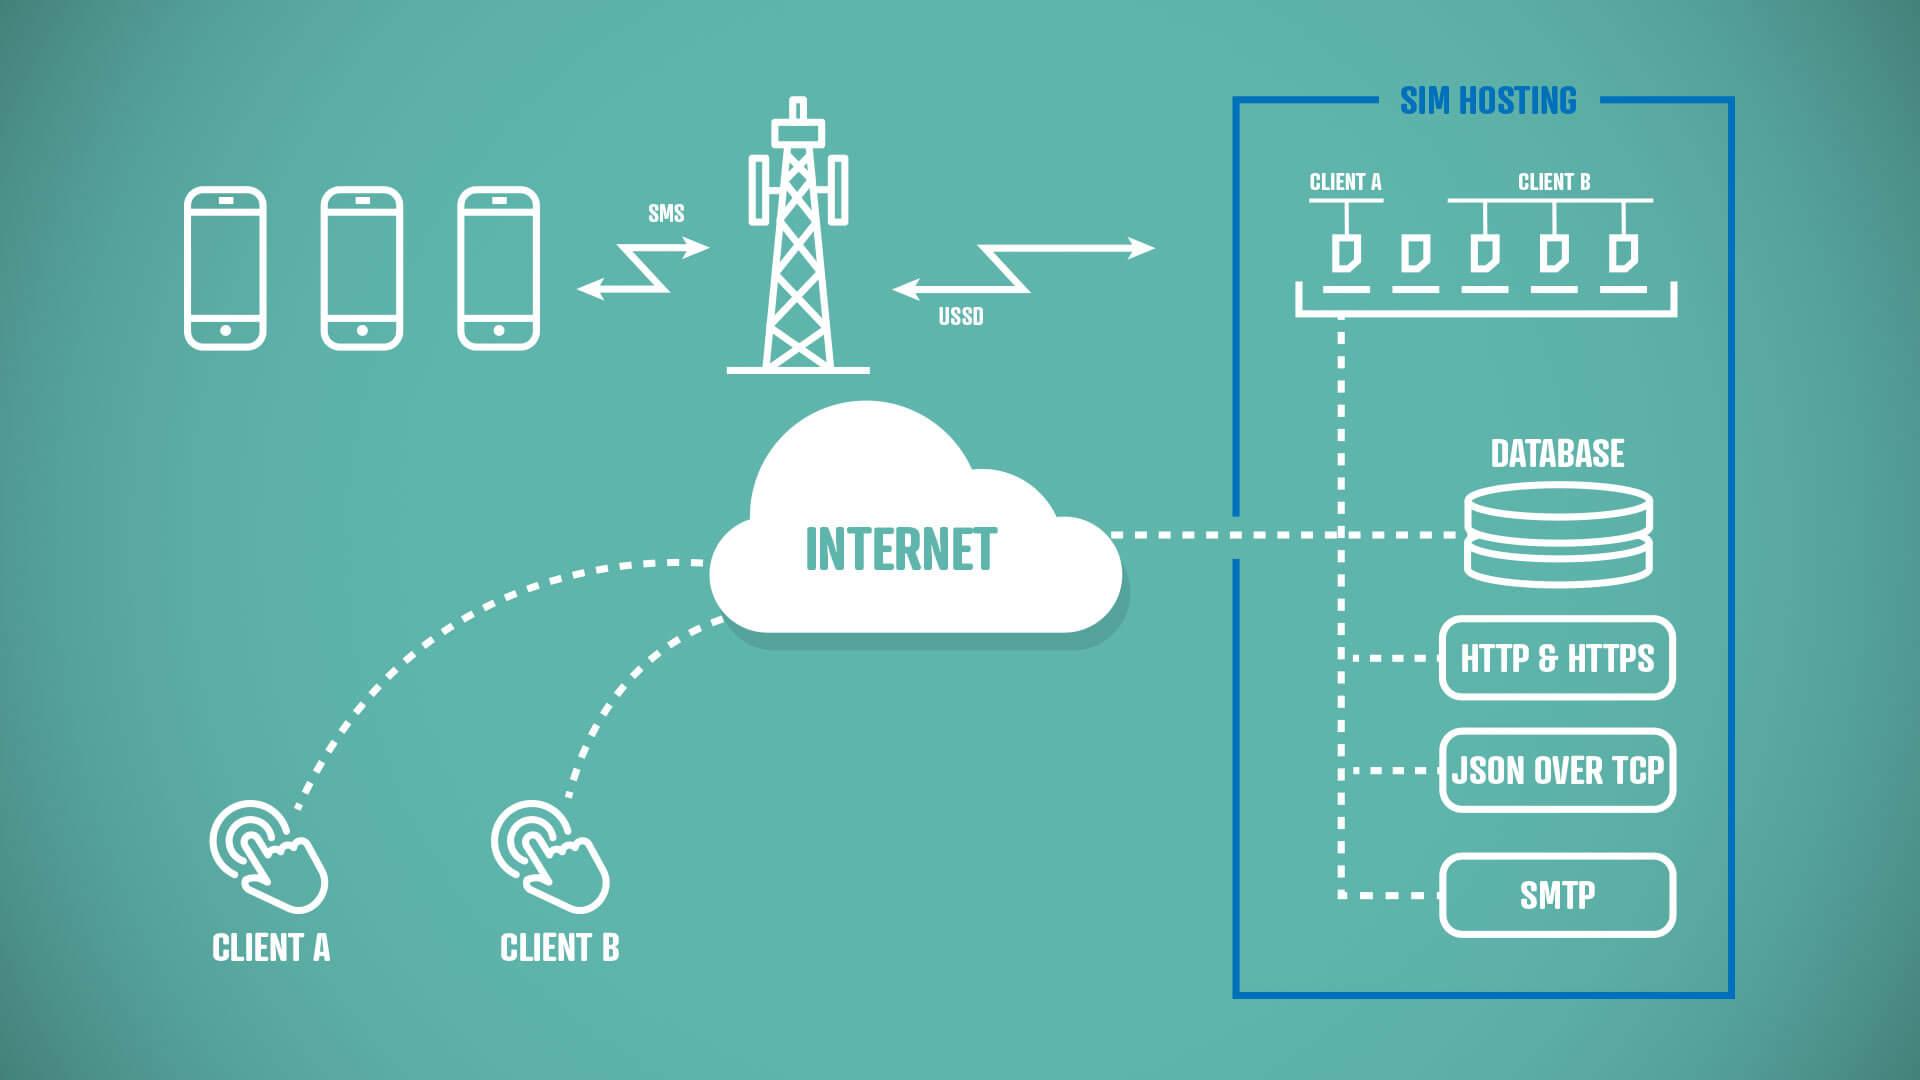 sim hosting diagram